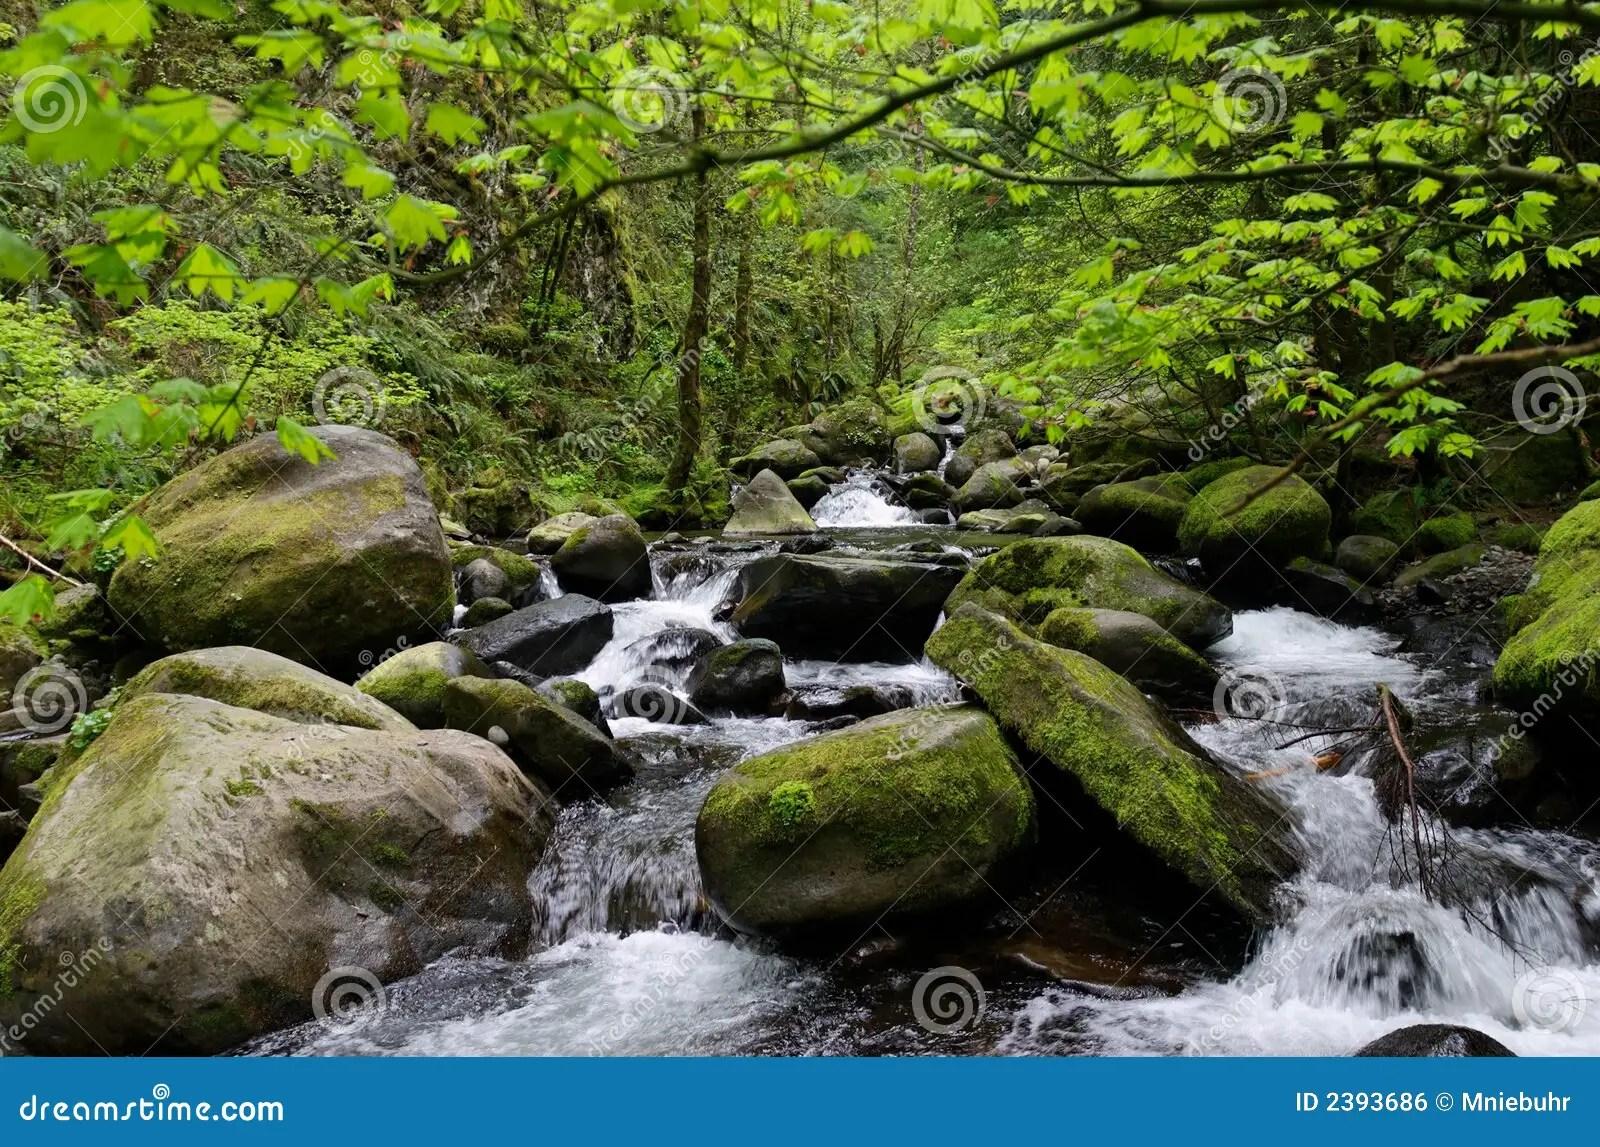 Large Round River Rocks